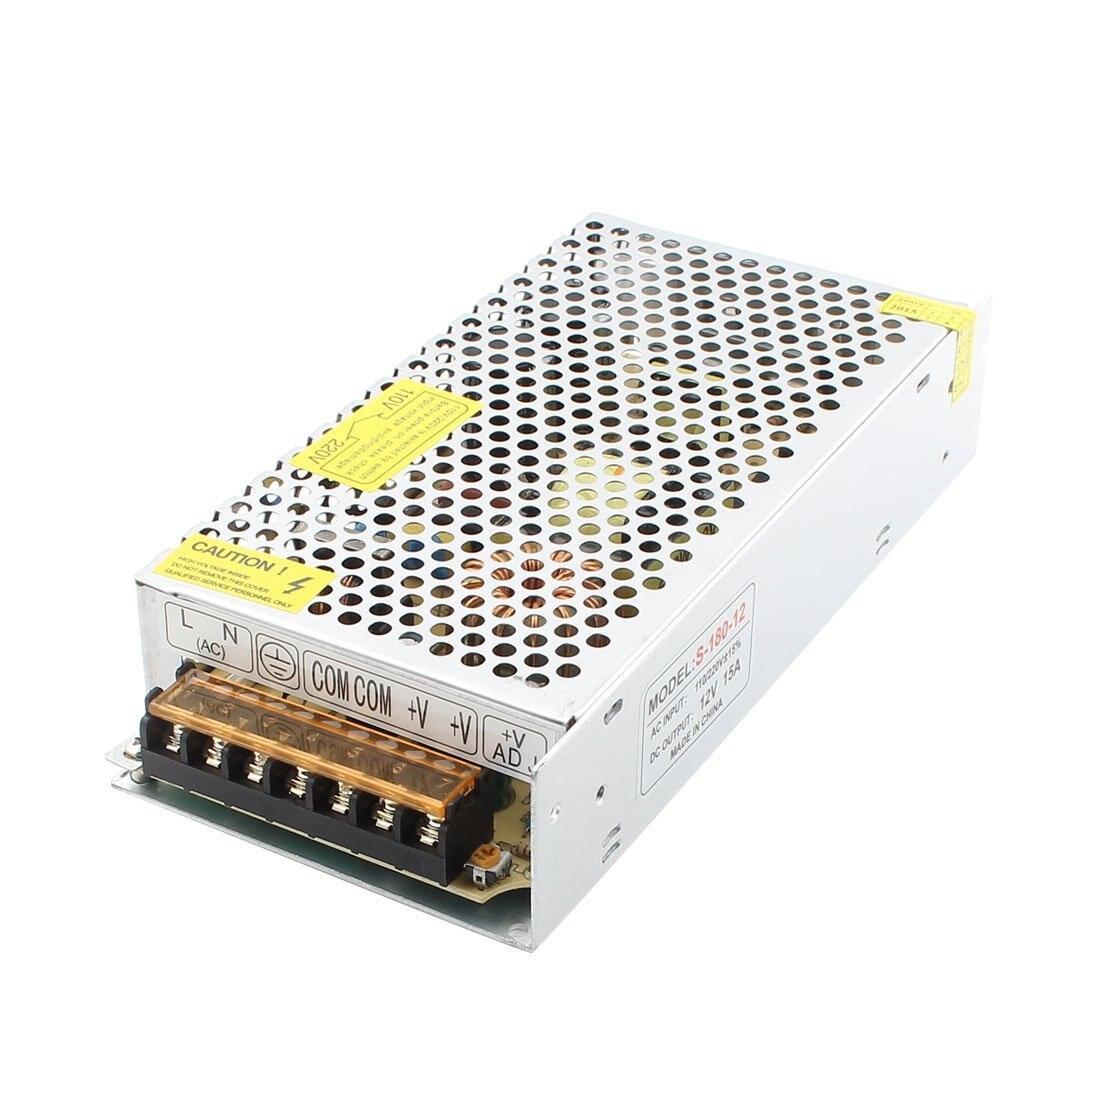 S-180-12 LED Strip Light Display Switch Power Supply DC 12V 15A 180W